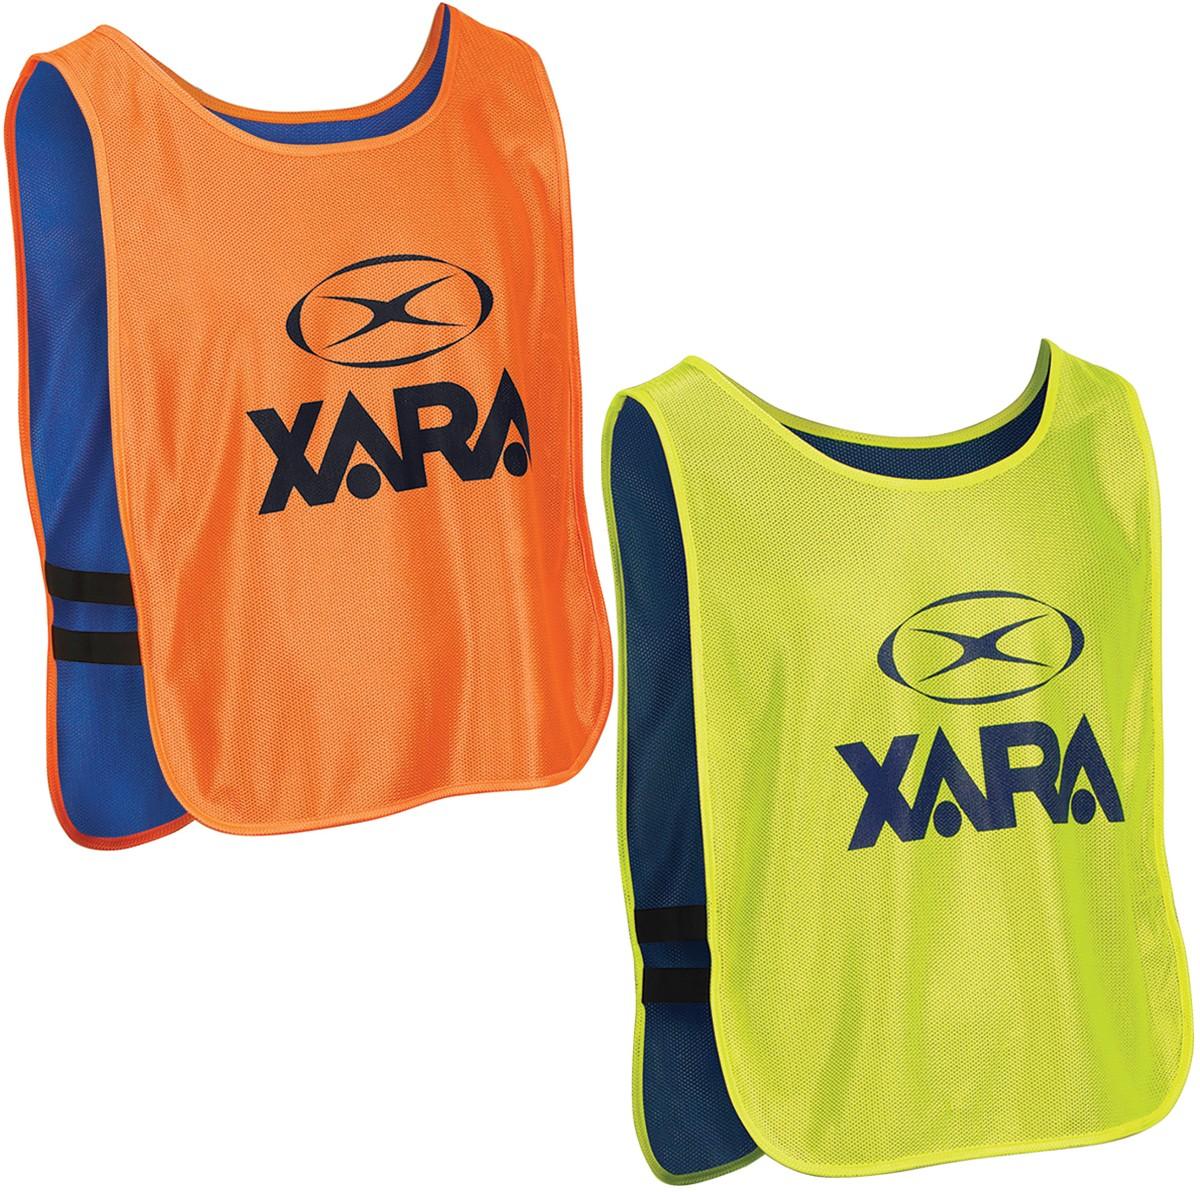 Xara Reversible Soccer Training Bib Pinnie Youth